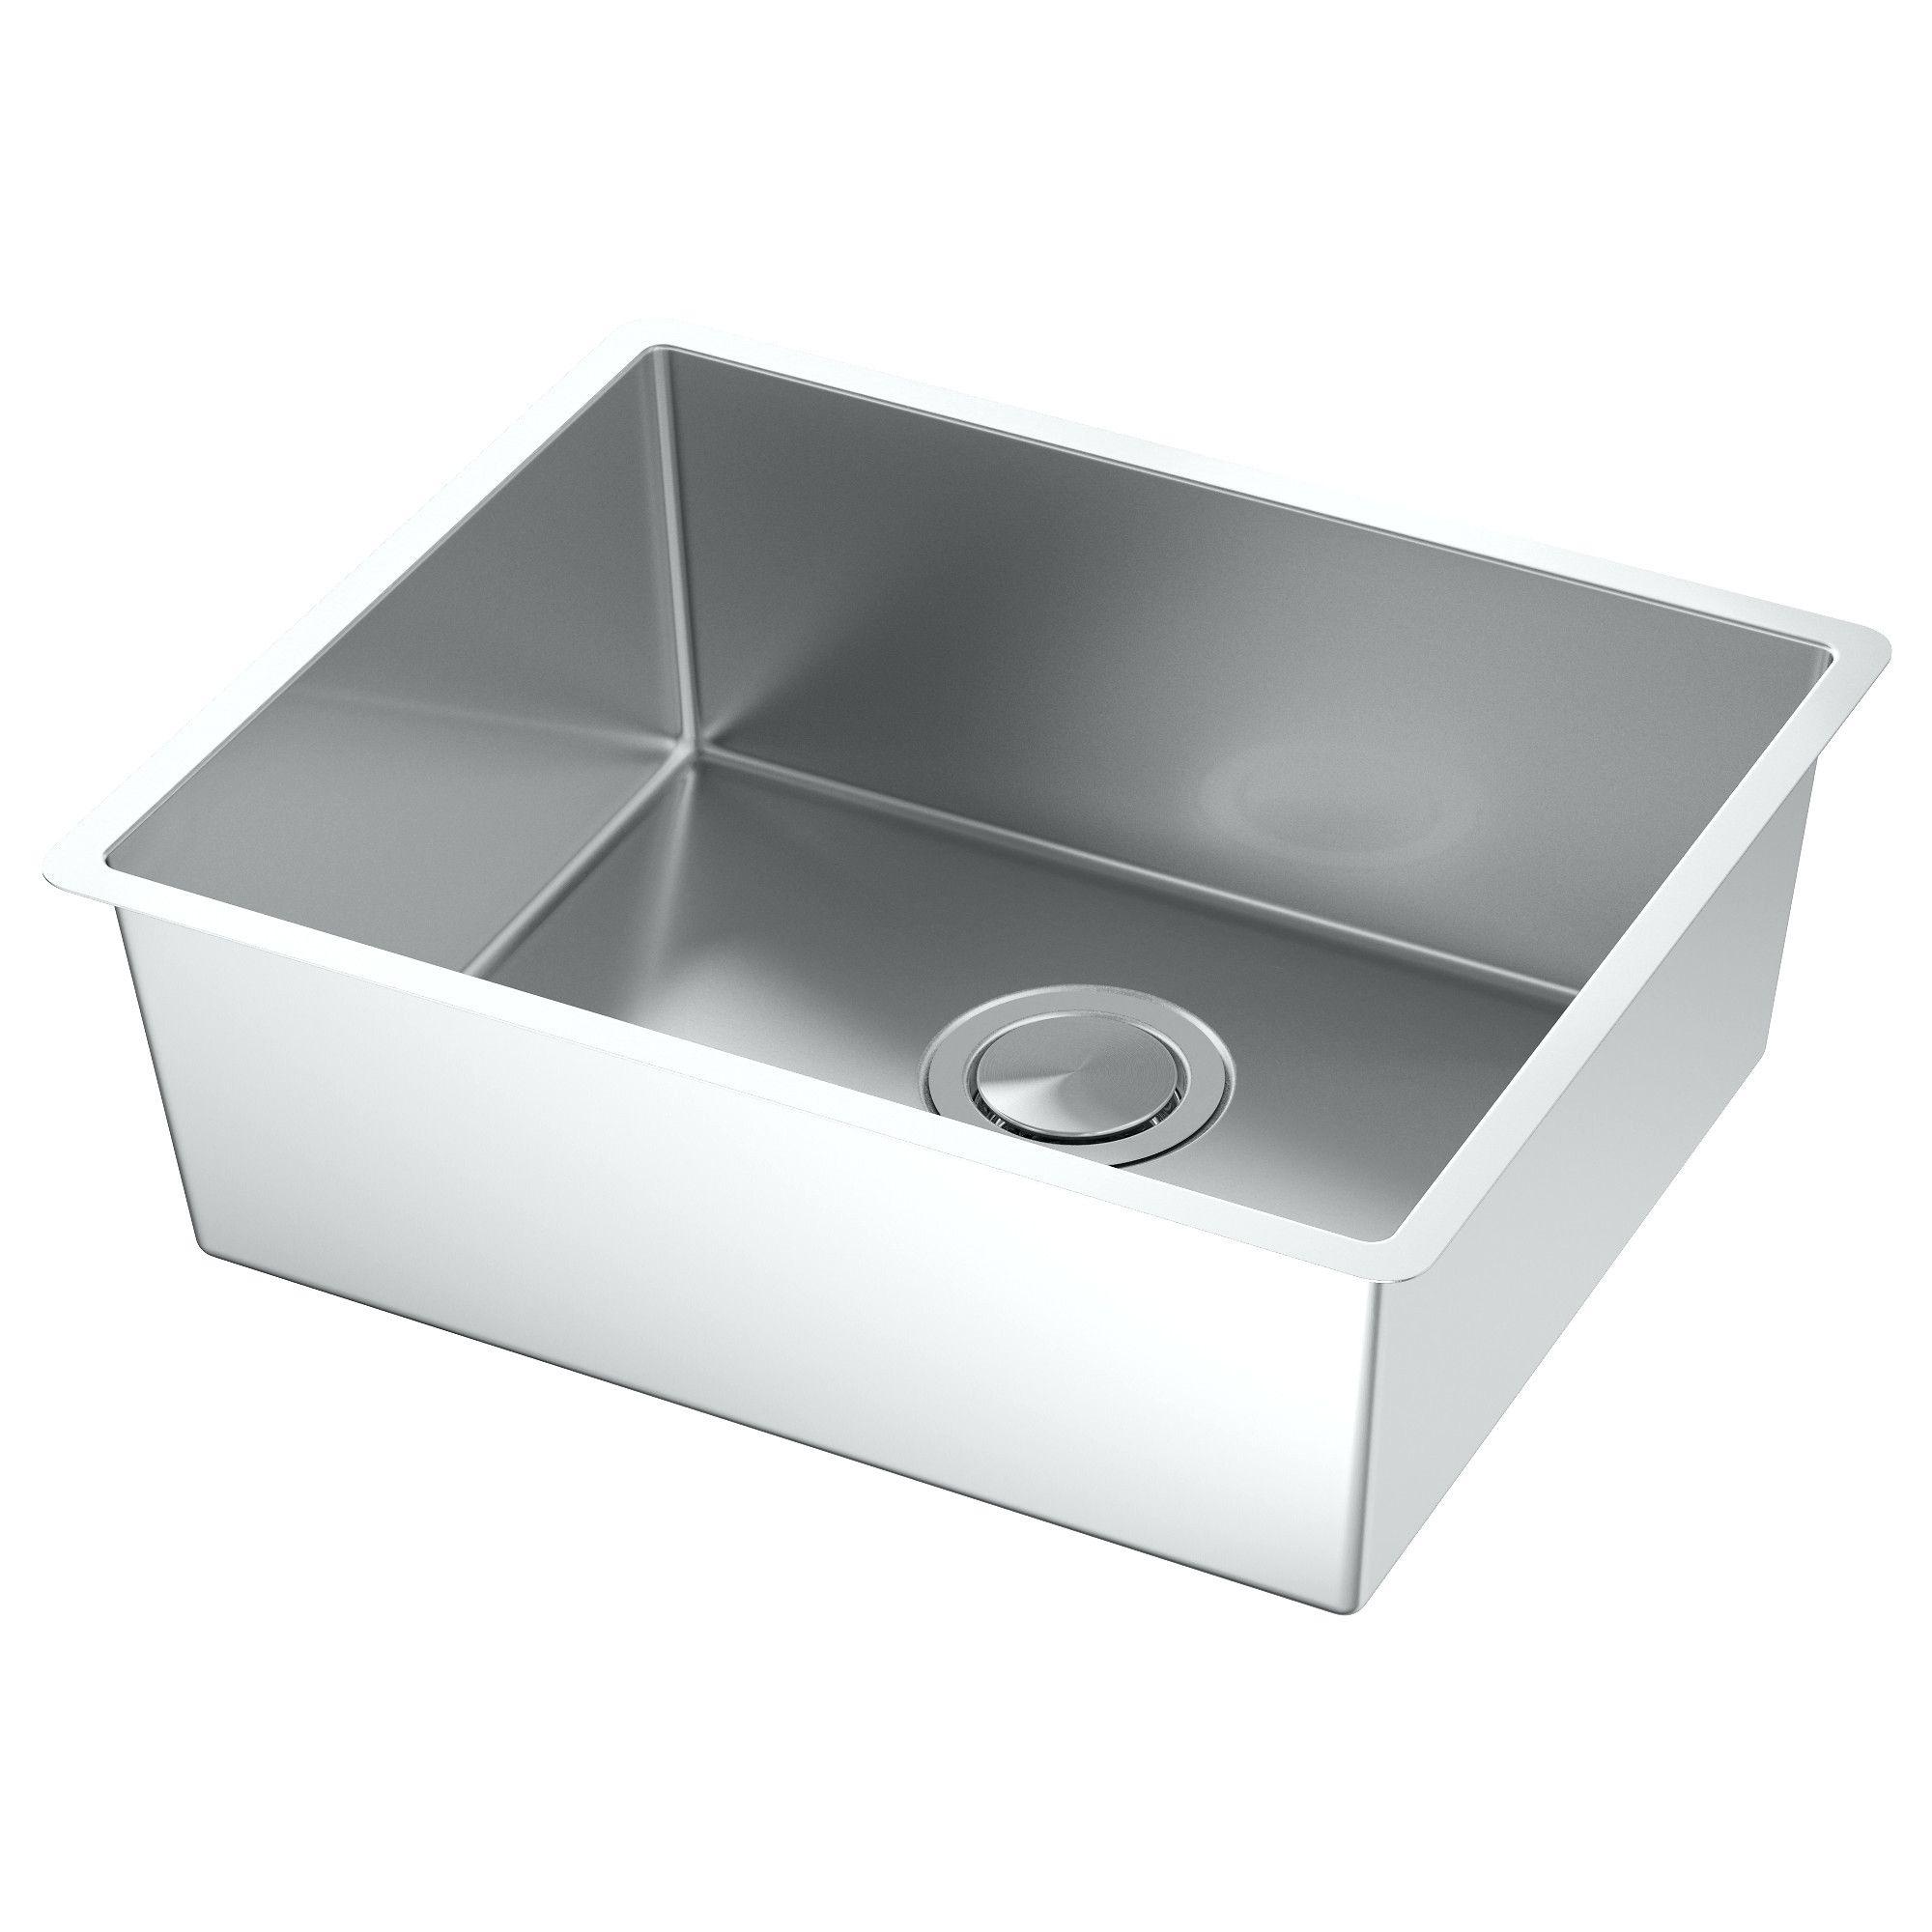 Deepest Single Bowl Kitchen Sink  Httpyonkoutei Classy Sink Kitchen Decorating Design